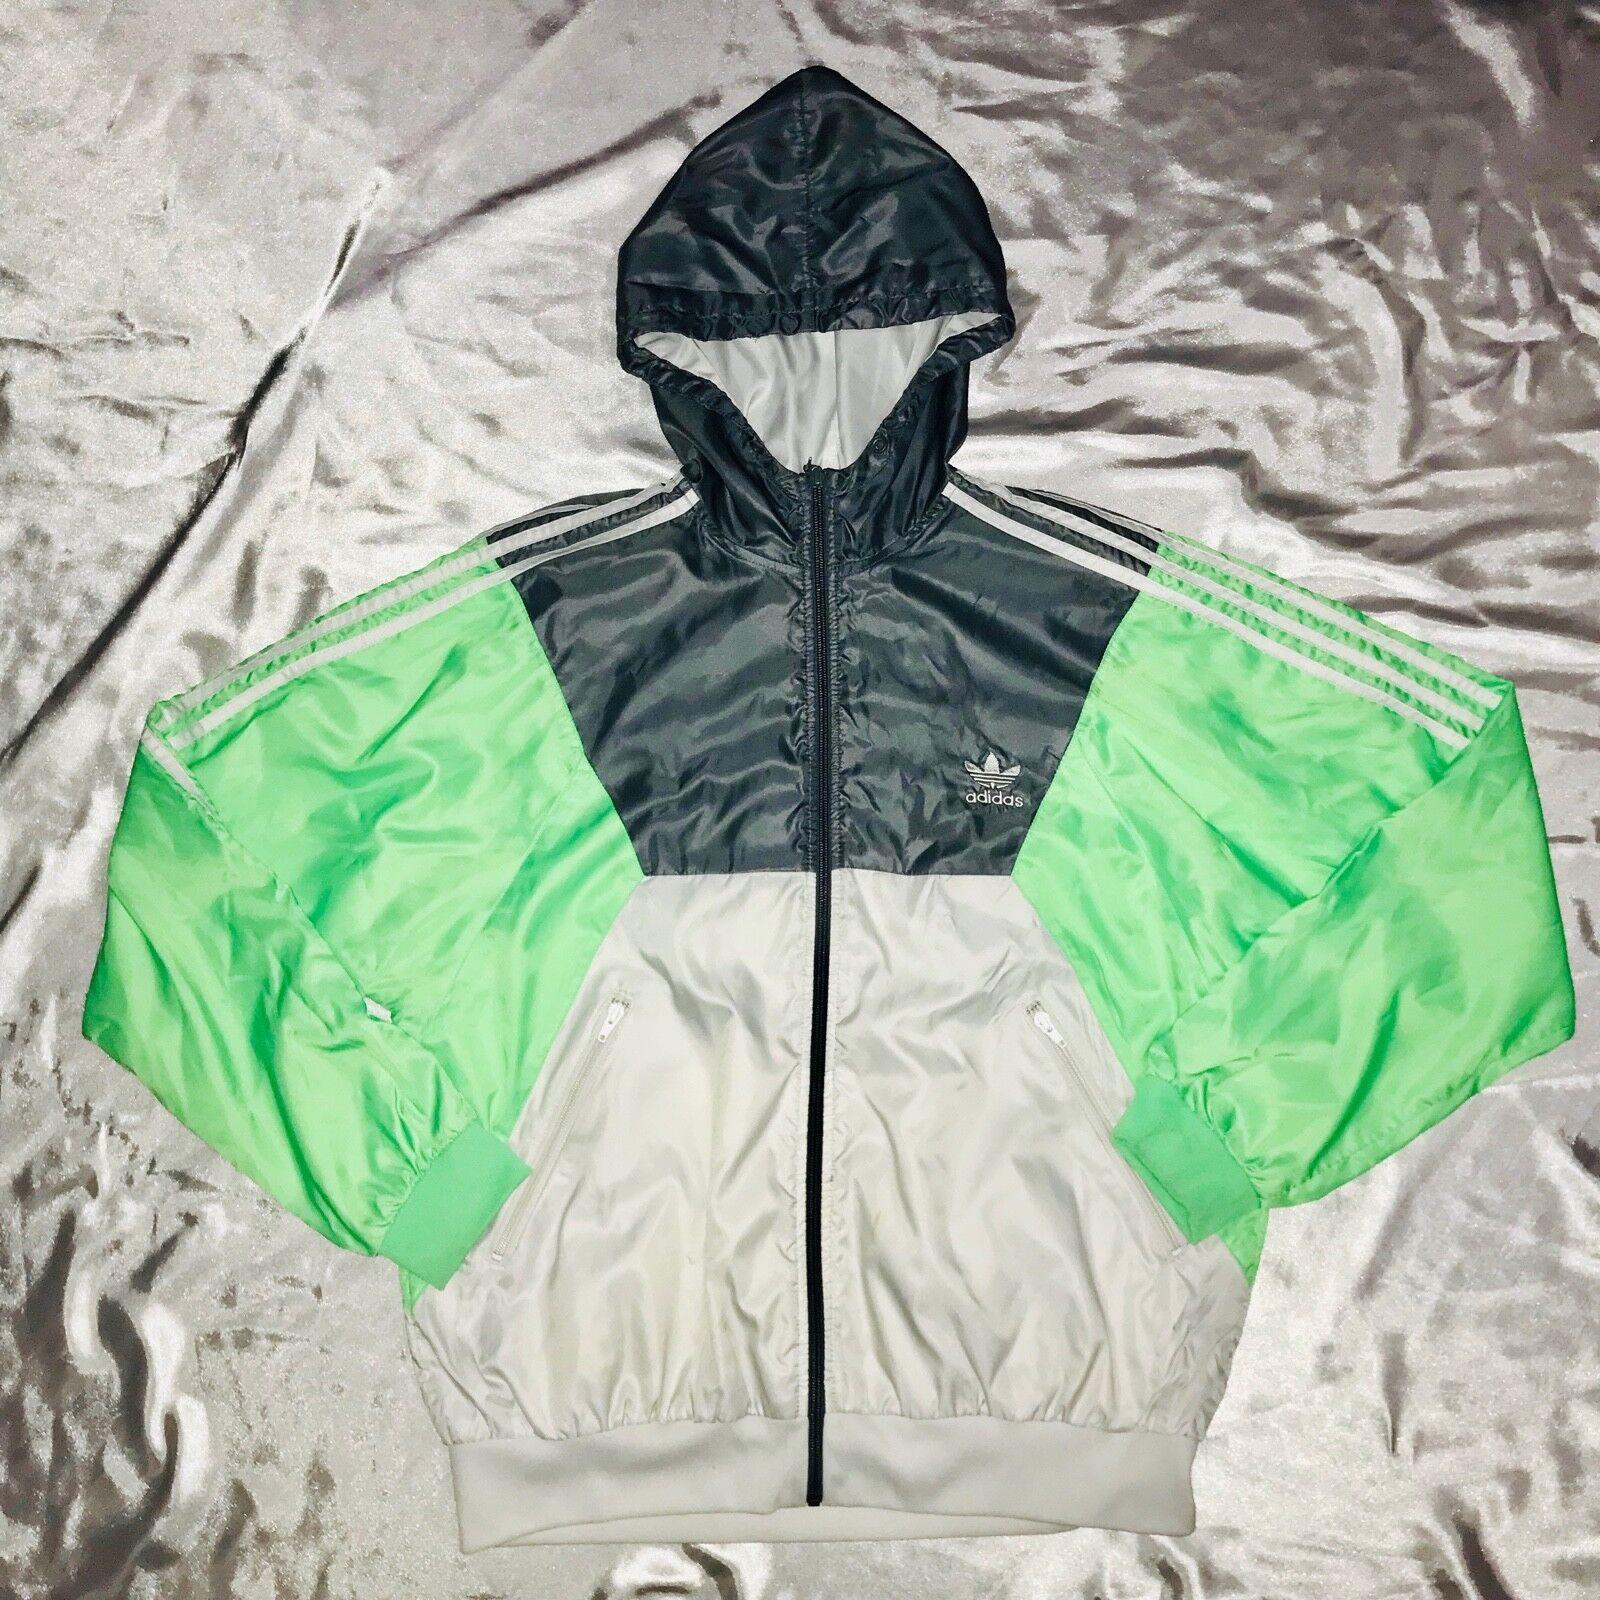 Windjacke Jacke Original Adidas Vintage Rare Super Grün XL